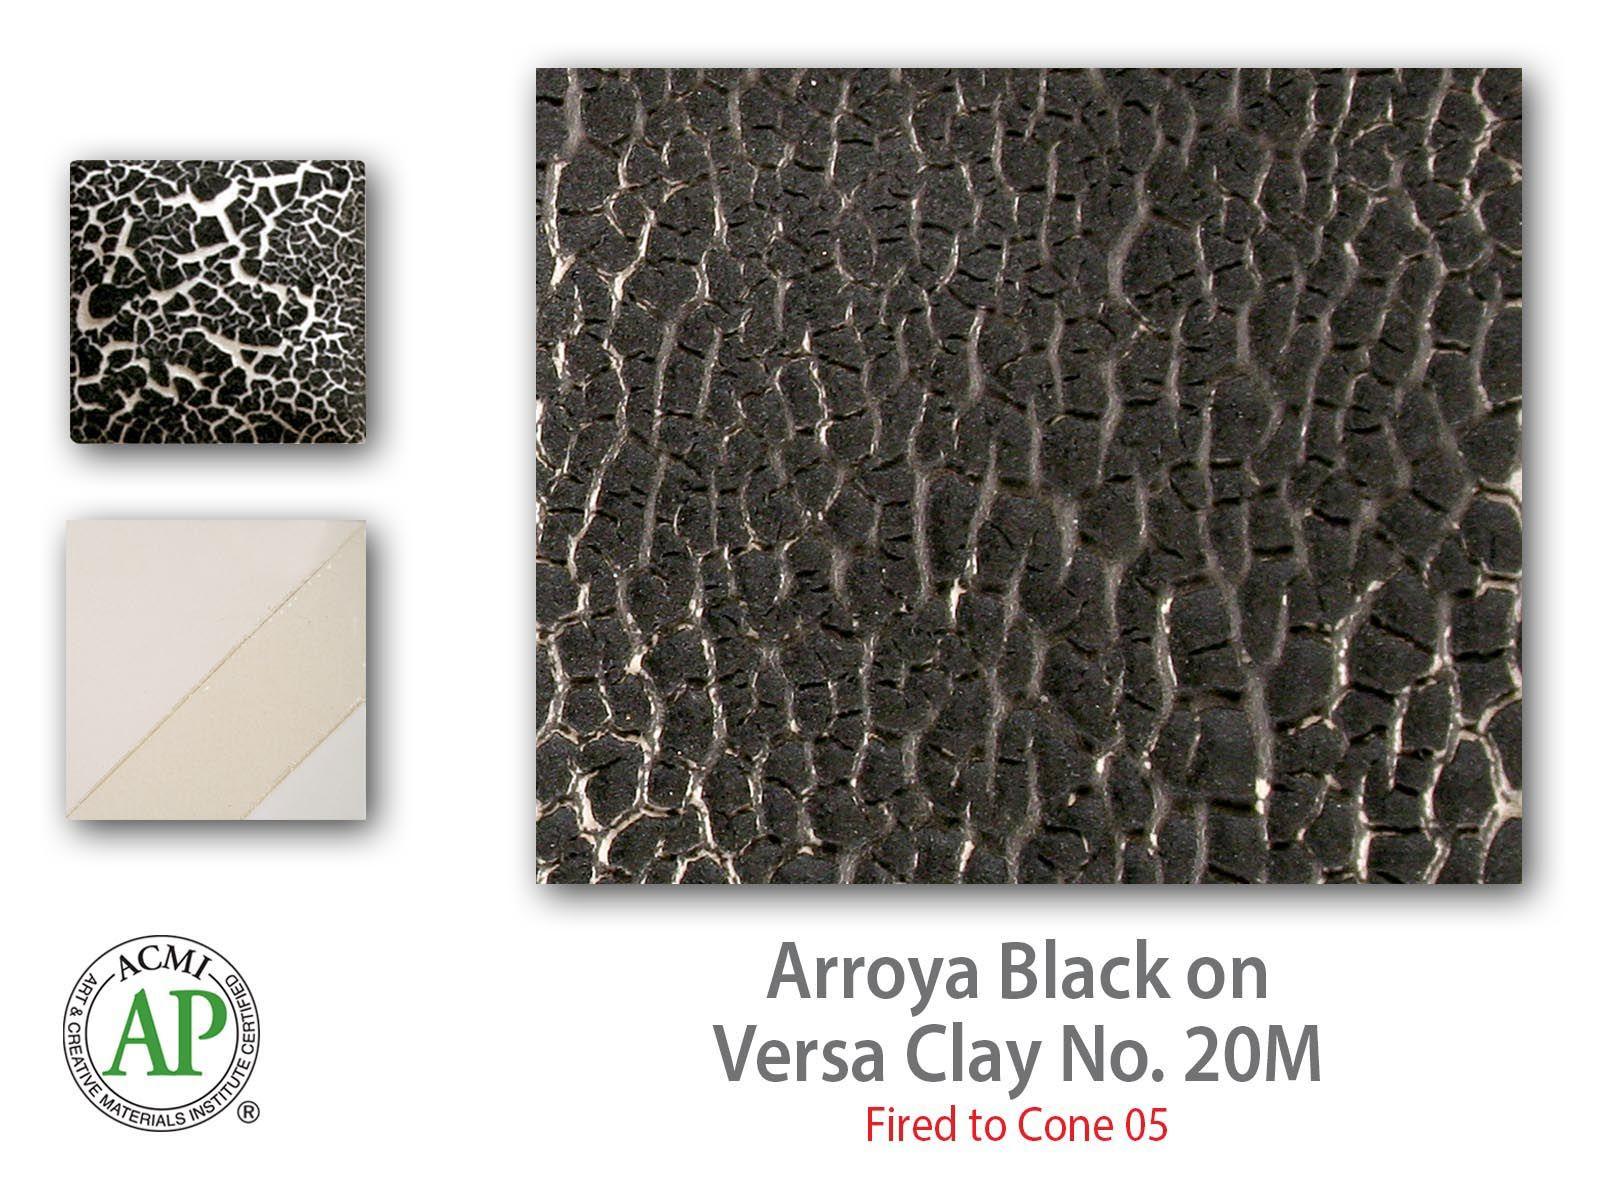 20m-under-arroya-black-cone05-pp.jpg (JPEG Image, 1600×1200 pixels) - Scaled (84%)